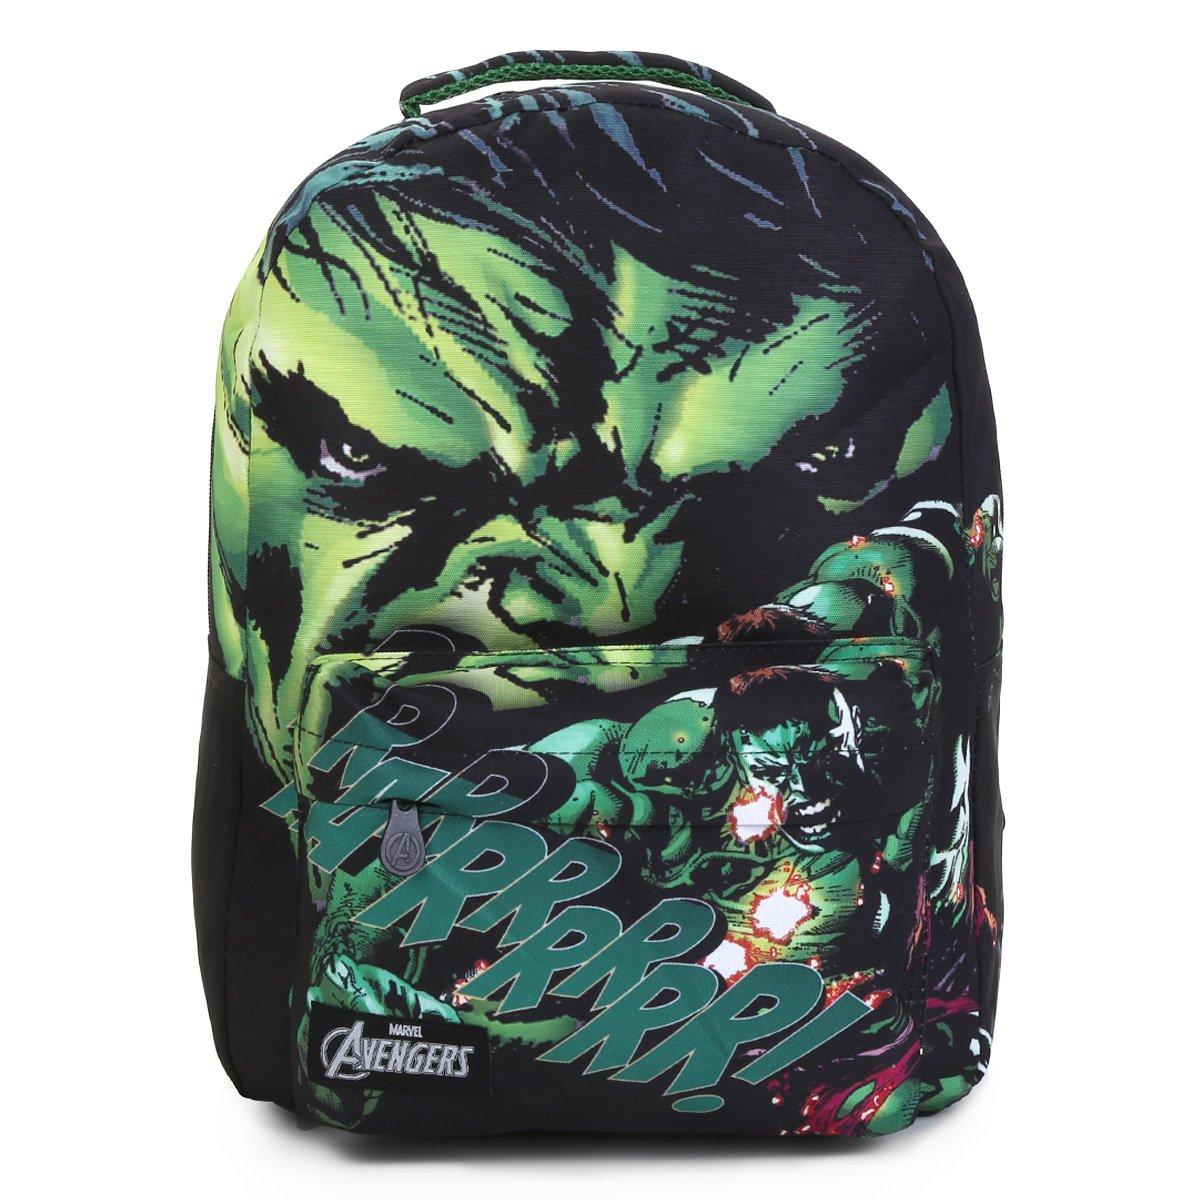 e8ce2e4dc Mochila Infantil Escolar Xeryus Avengers Hulk T4